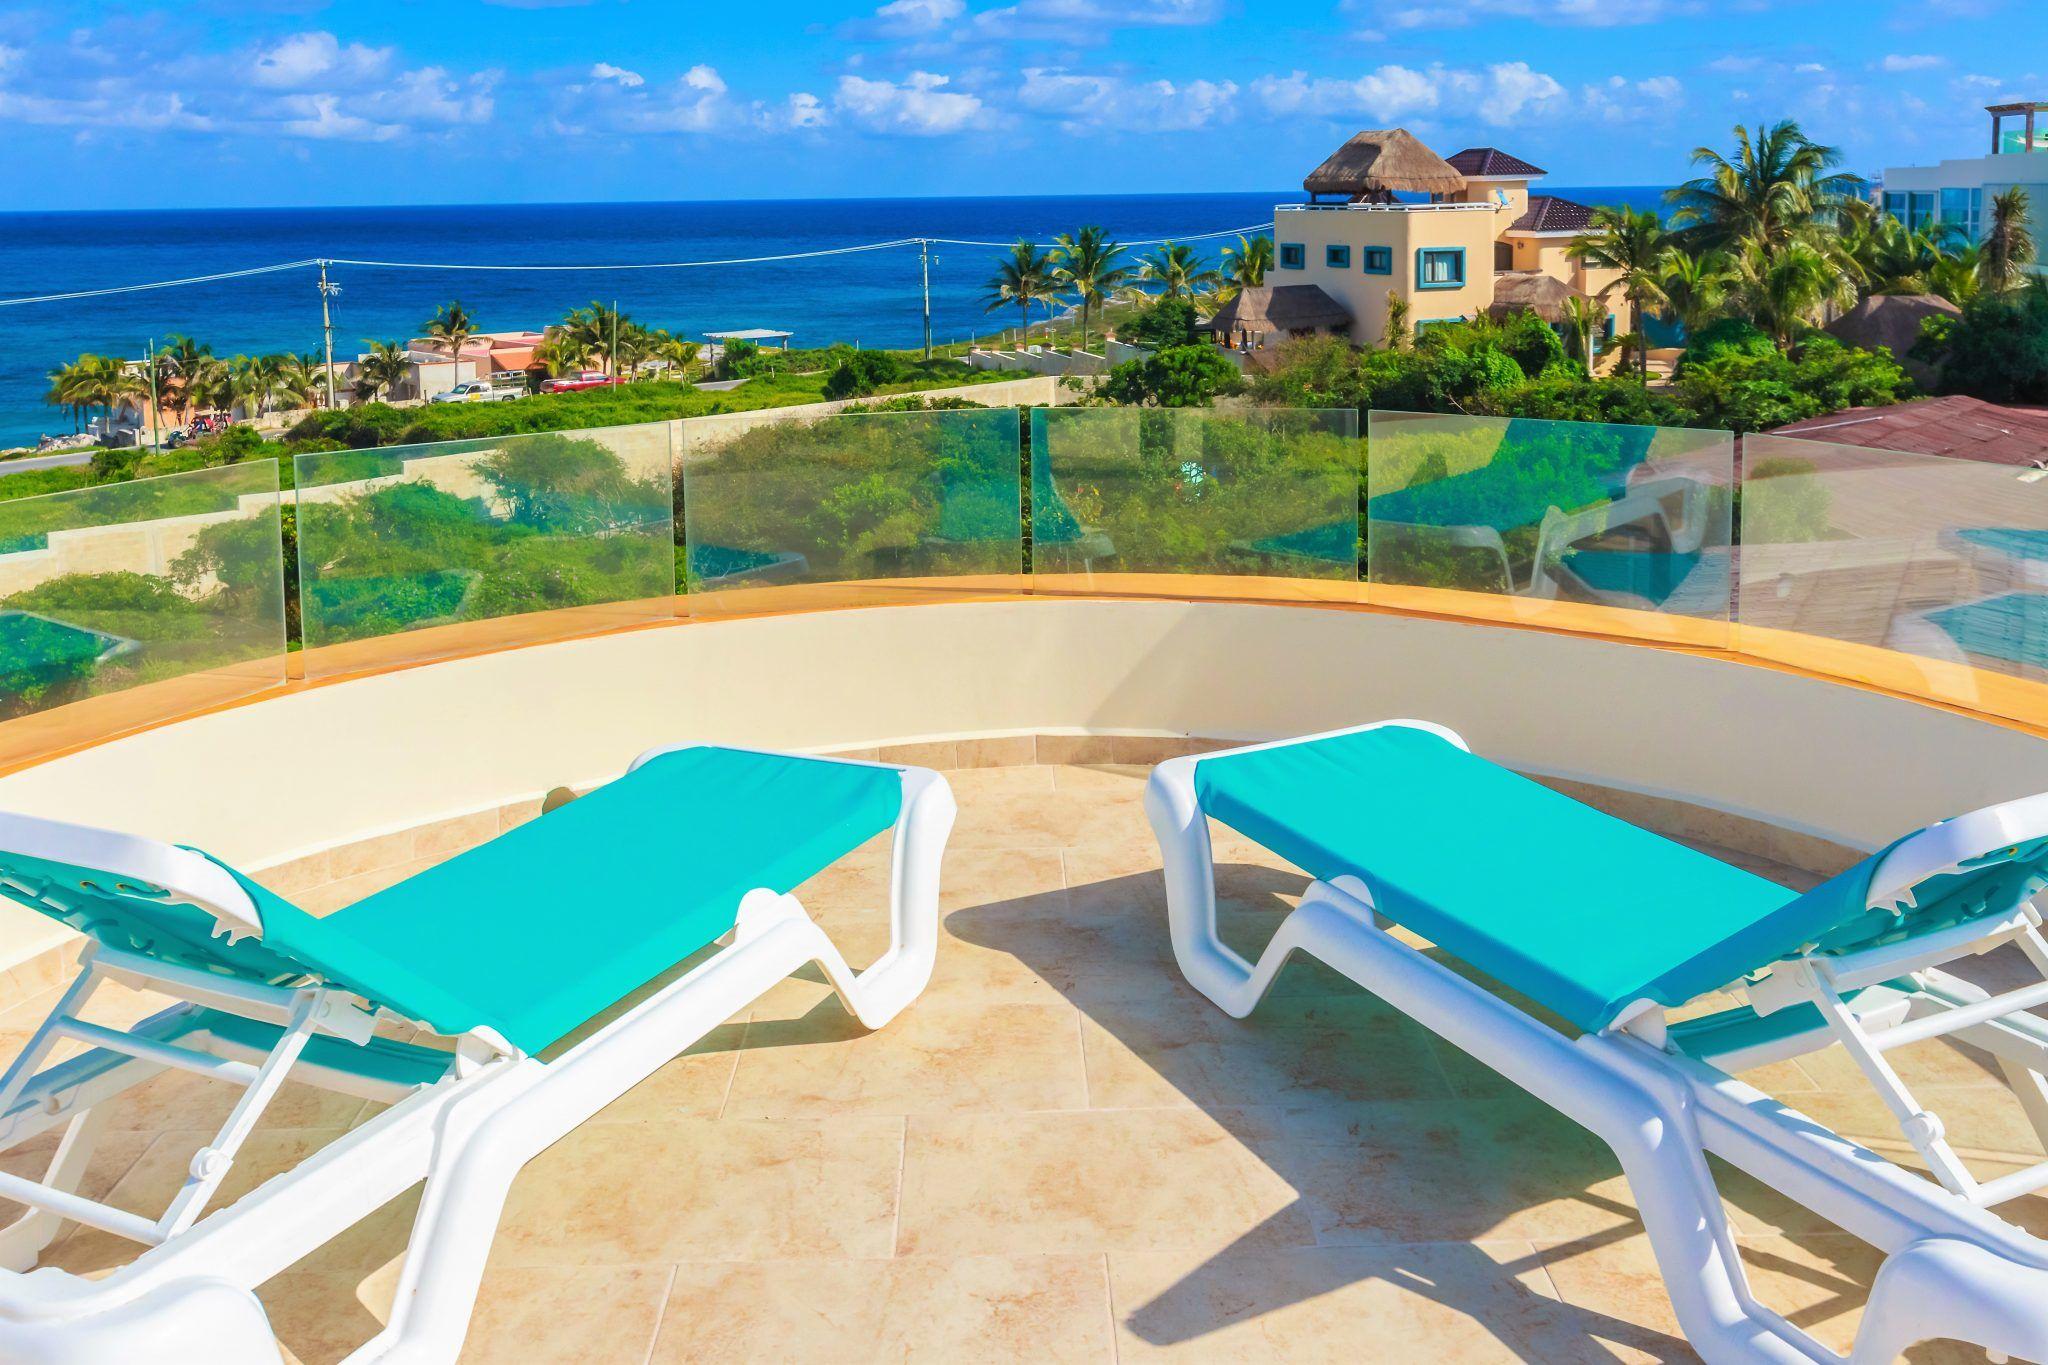 Isla Mujeres Vacation Rental Casa Elegante Roof Ocean View